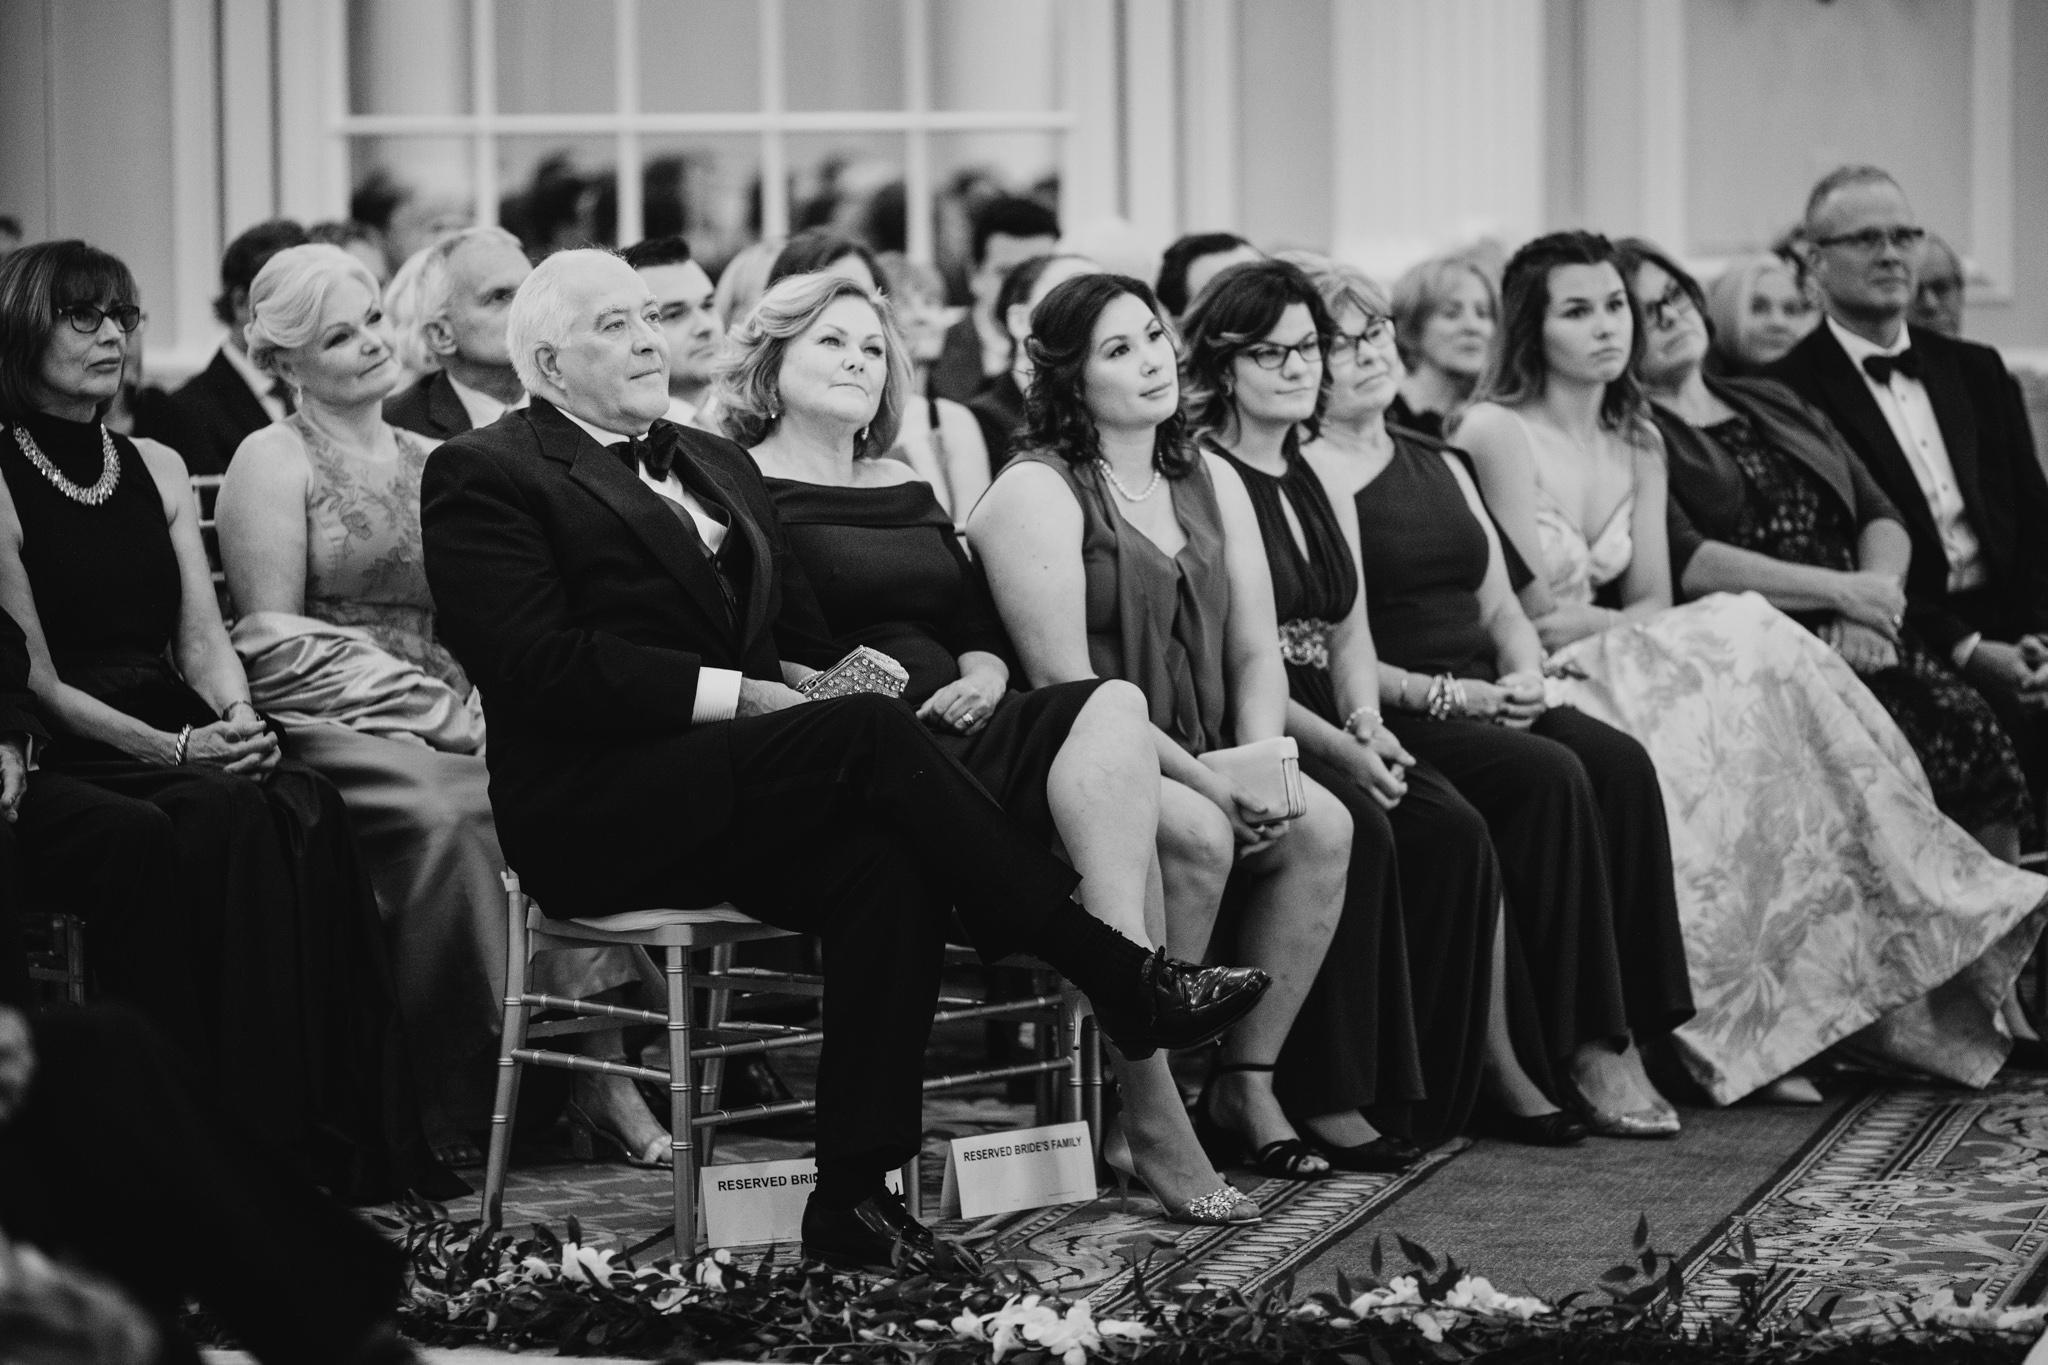 472-WEB-Jonathan-Kuhn-Photography-Amanda-Brennan-Wedding-9604.jpg